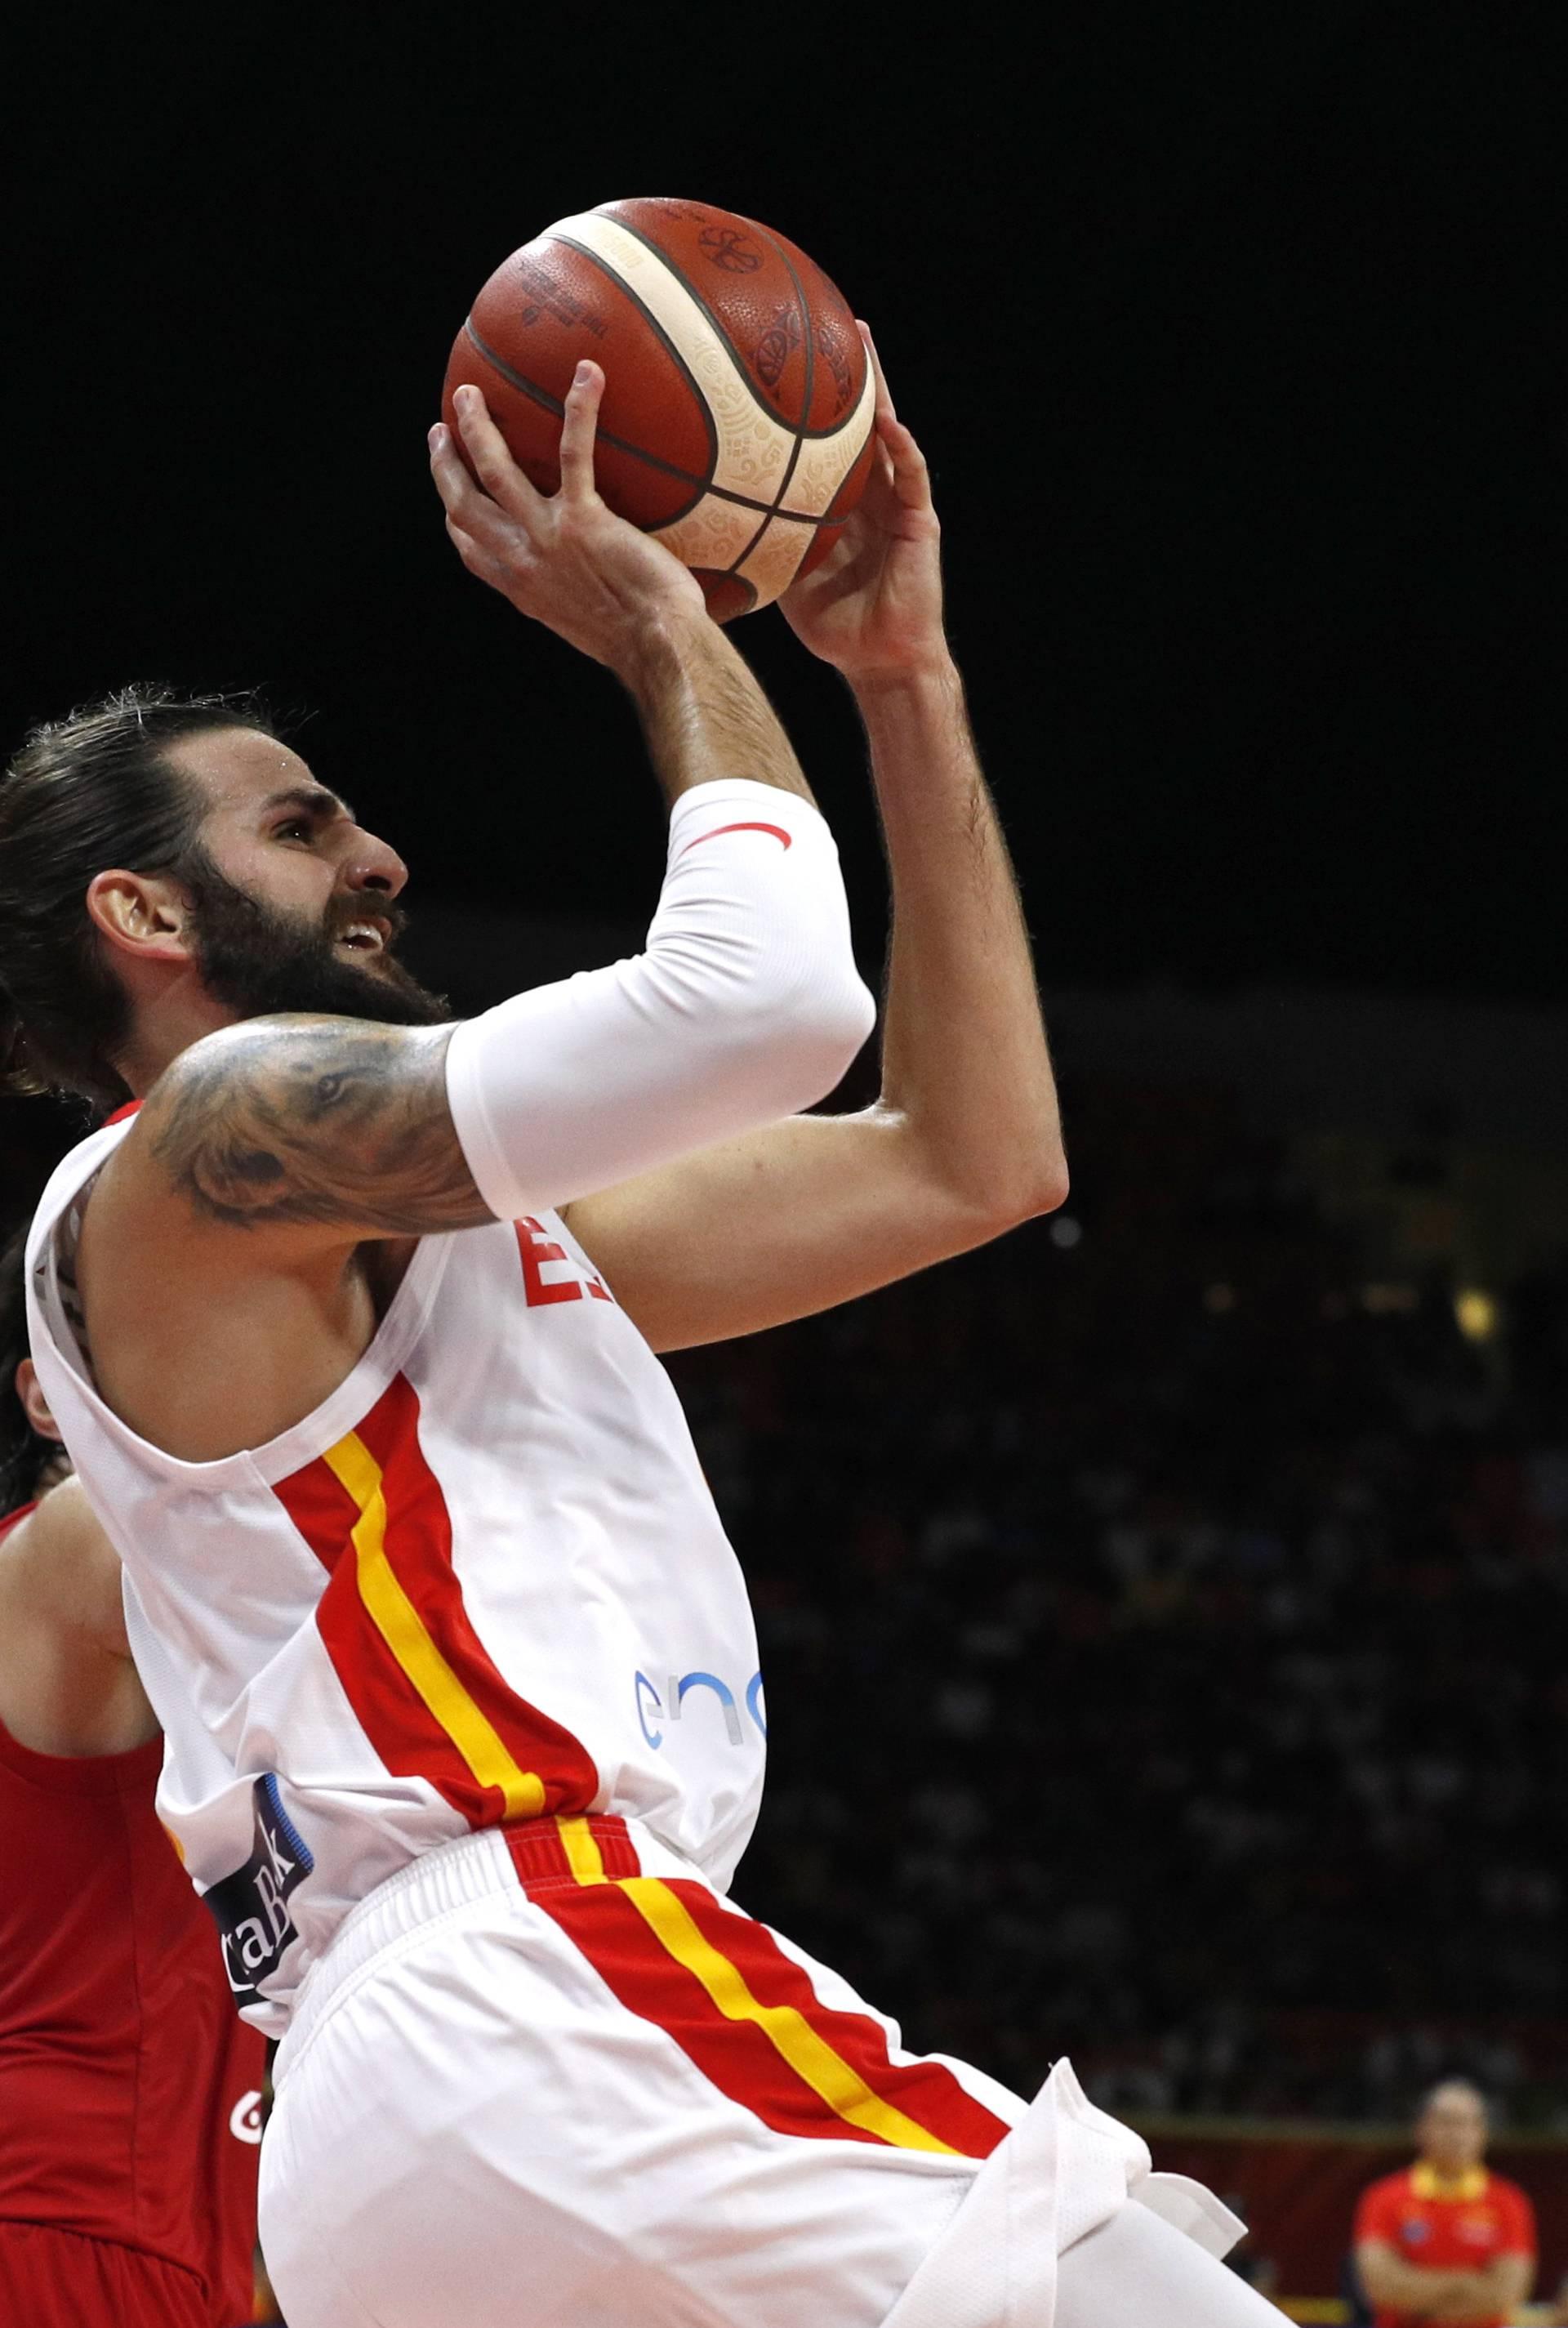 Basketball - FIBA World Cup - First Round - Group C - Spain v Iran